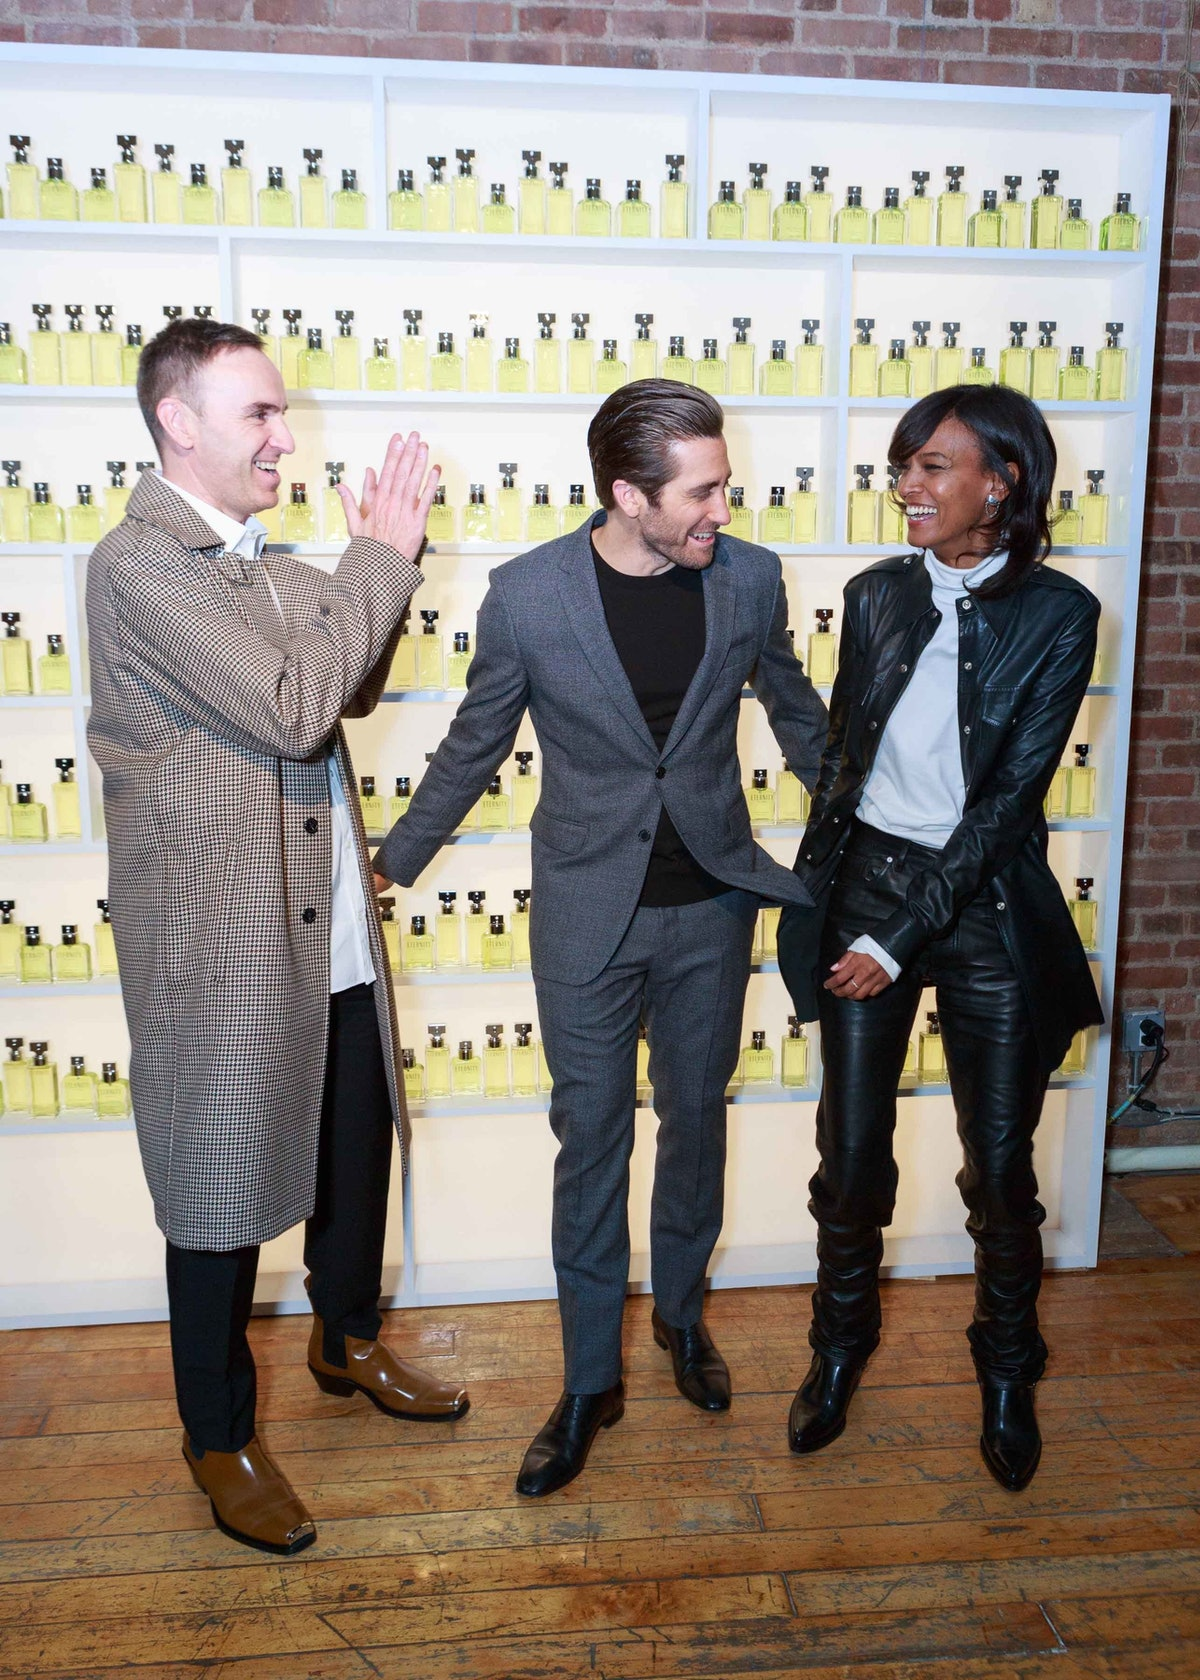 CALVIN KLEIN Hosts Private Dinner to Celebrate :New Faces of ETERNITY CALVIN KLEIN Jake Gyllenhaal + Liya Kebede